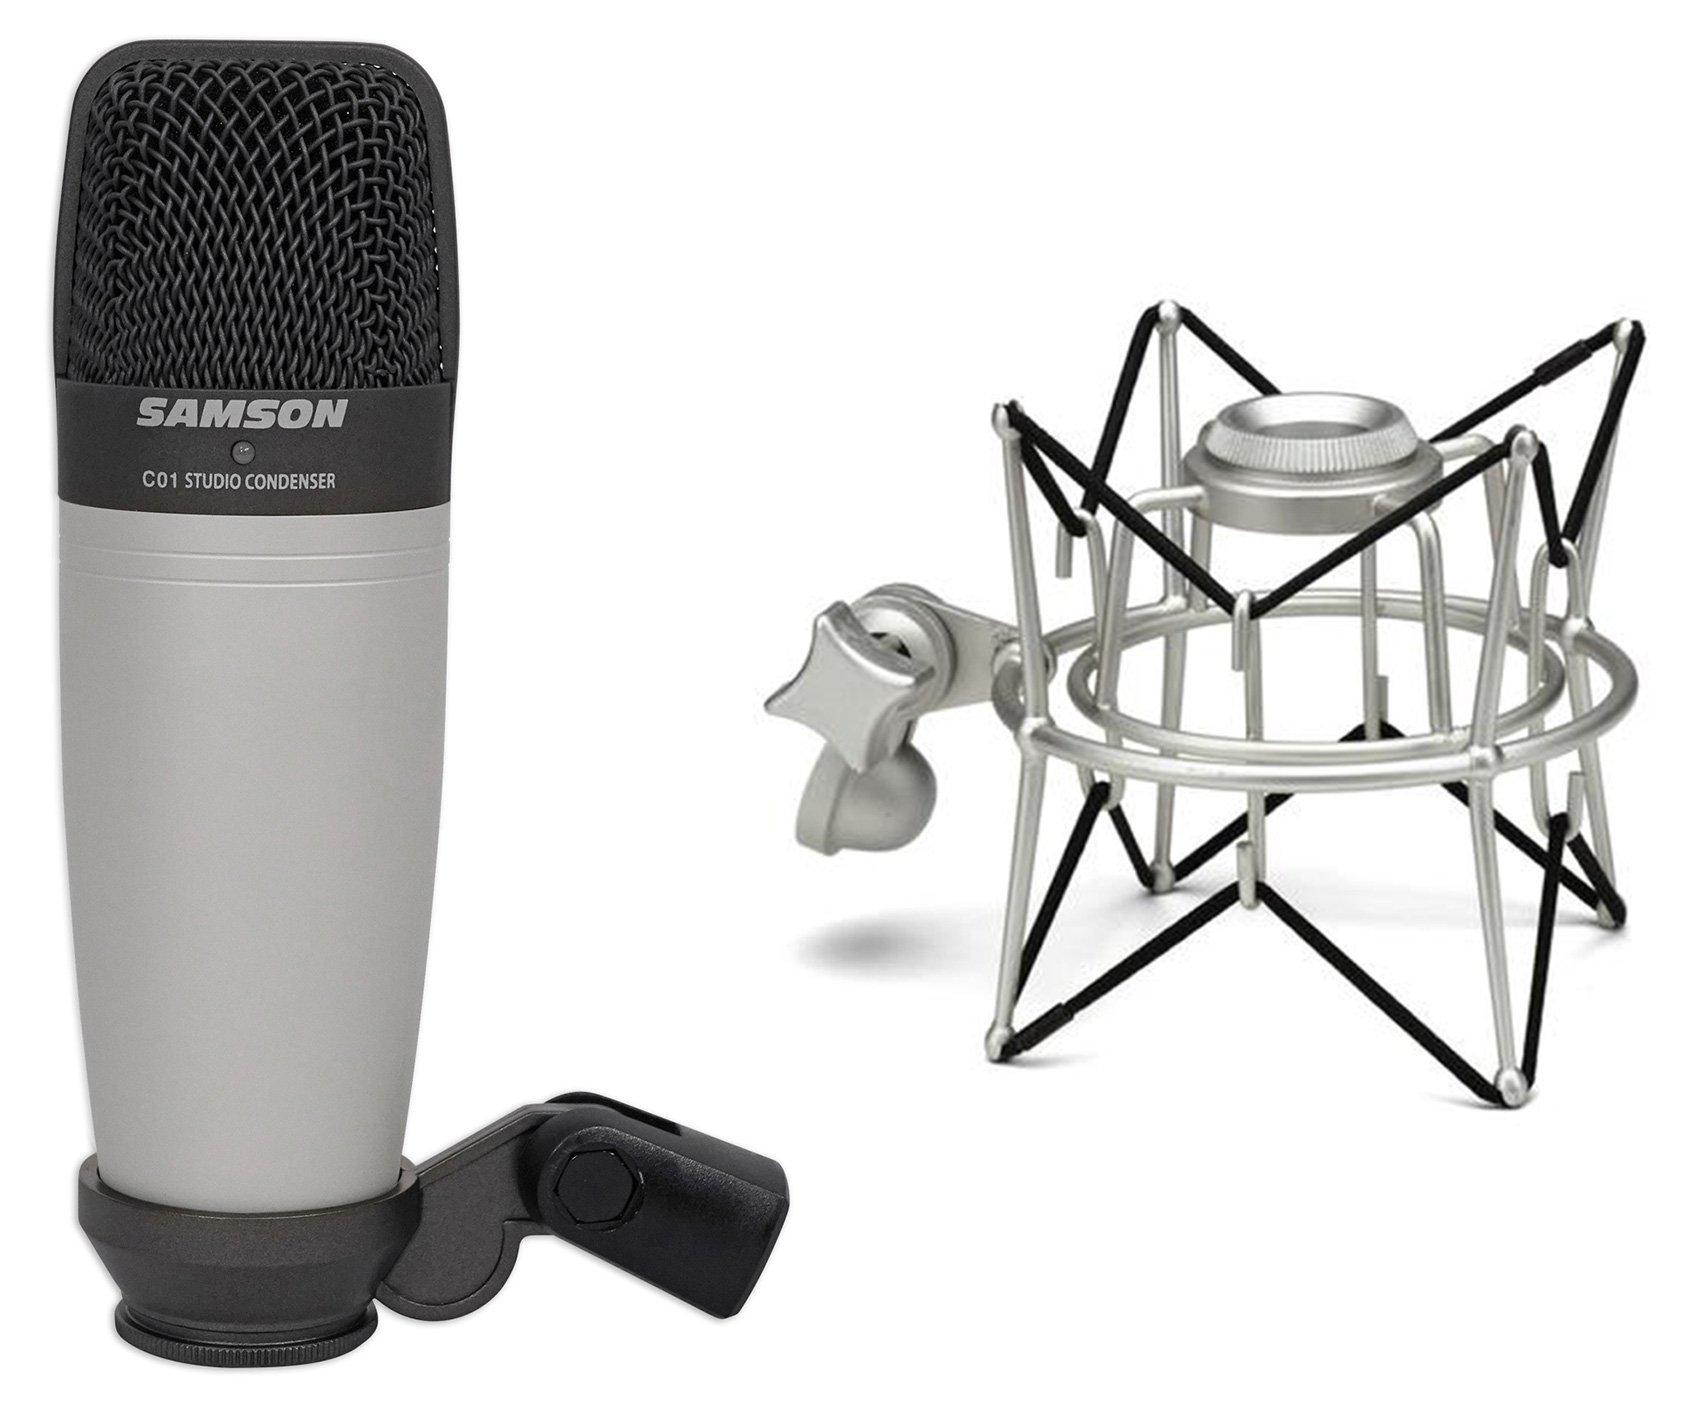 Samson C01 Studio Condenser Recording Microphone Mic + Spider Shock Mount by Samson Technologies (Image #1)